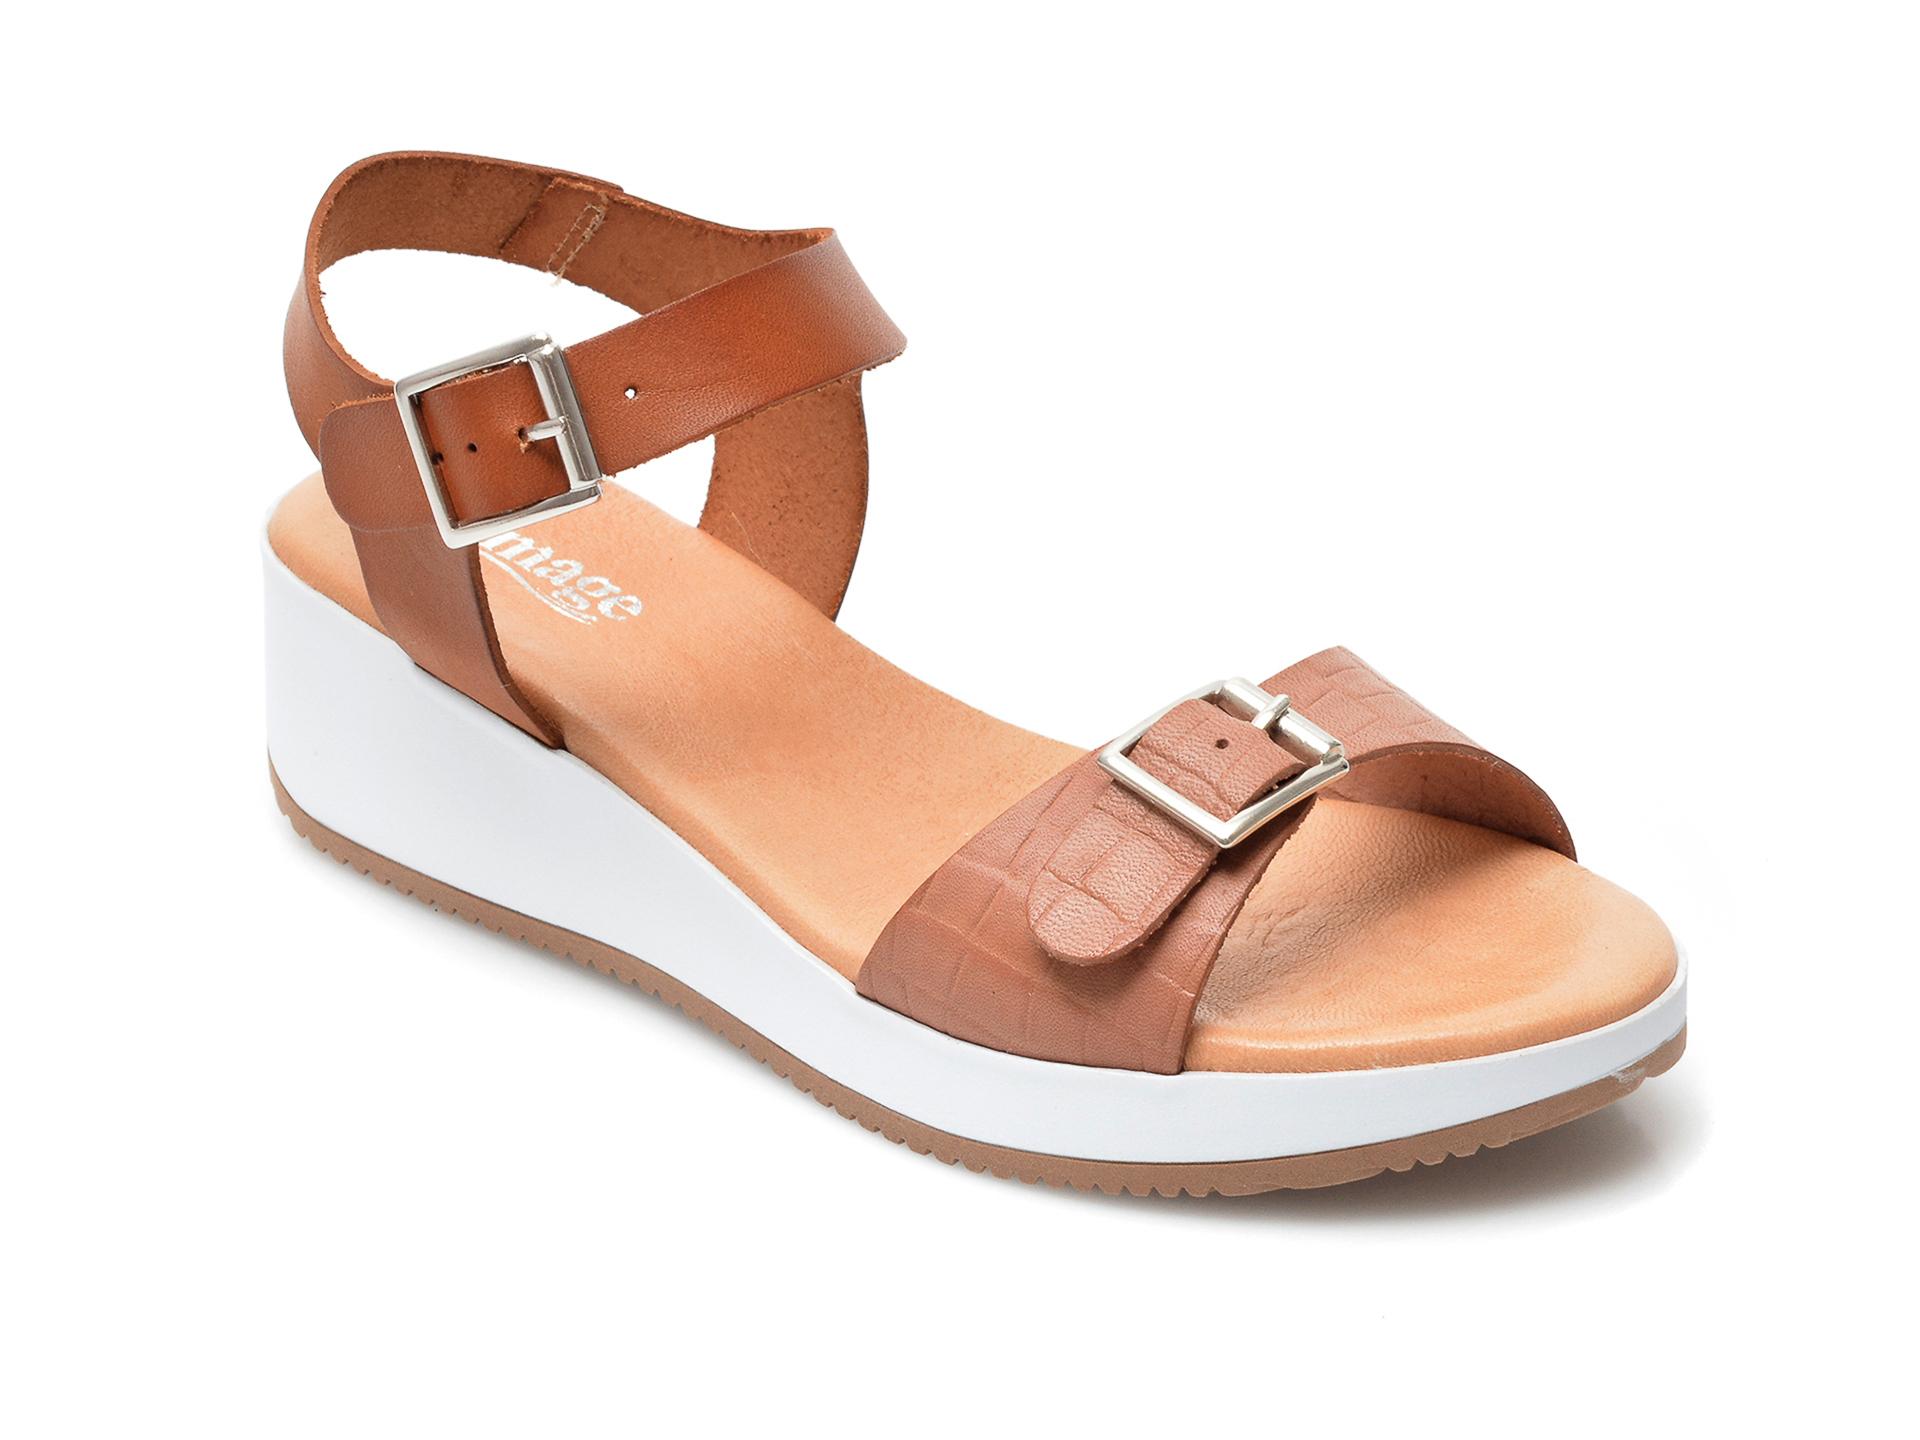 Sandale IMAGE maro, 1411S, din piele naturala imagine otter.ro 2021